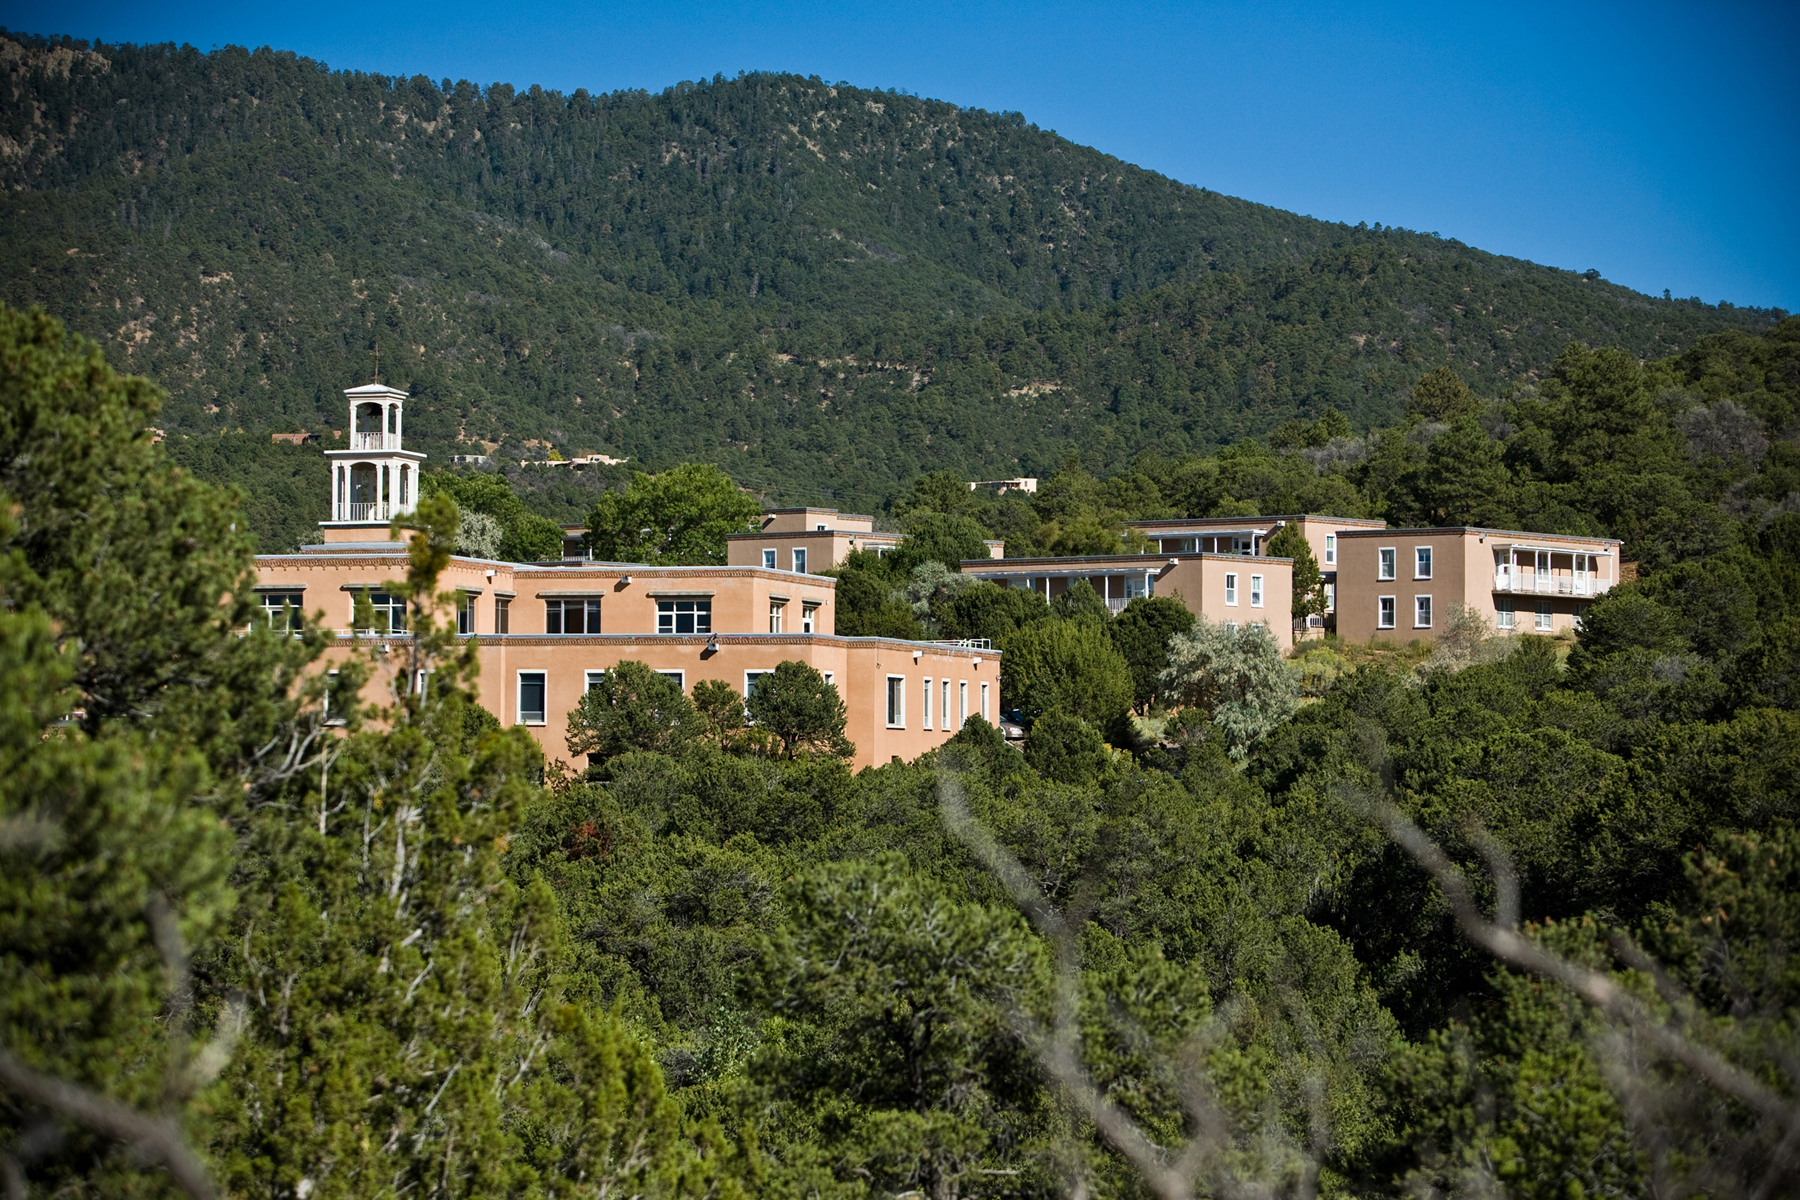 St. John's College Summer Academy, Santa Fe